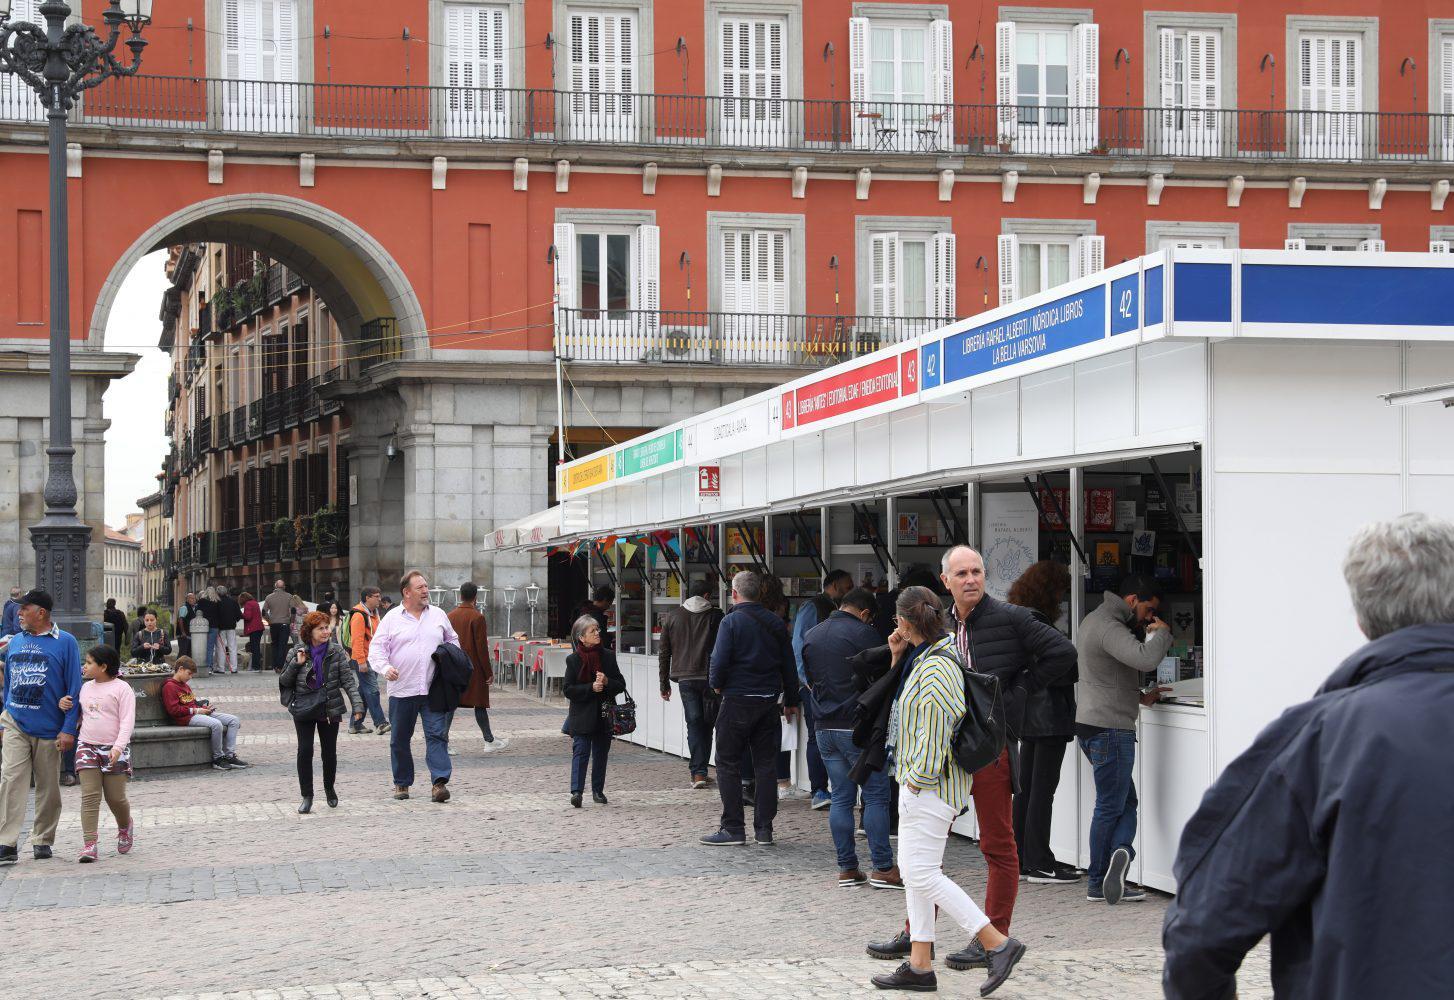 edicion feria libro madrid plaza mayor